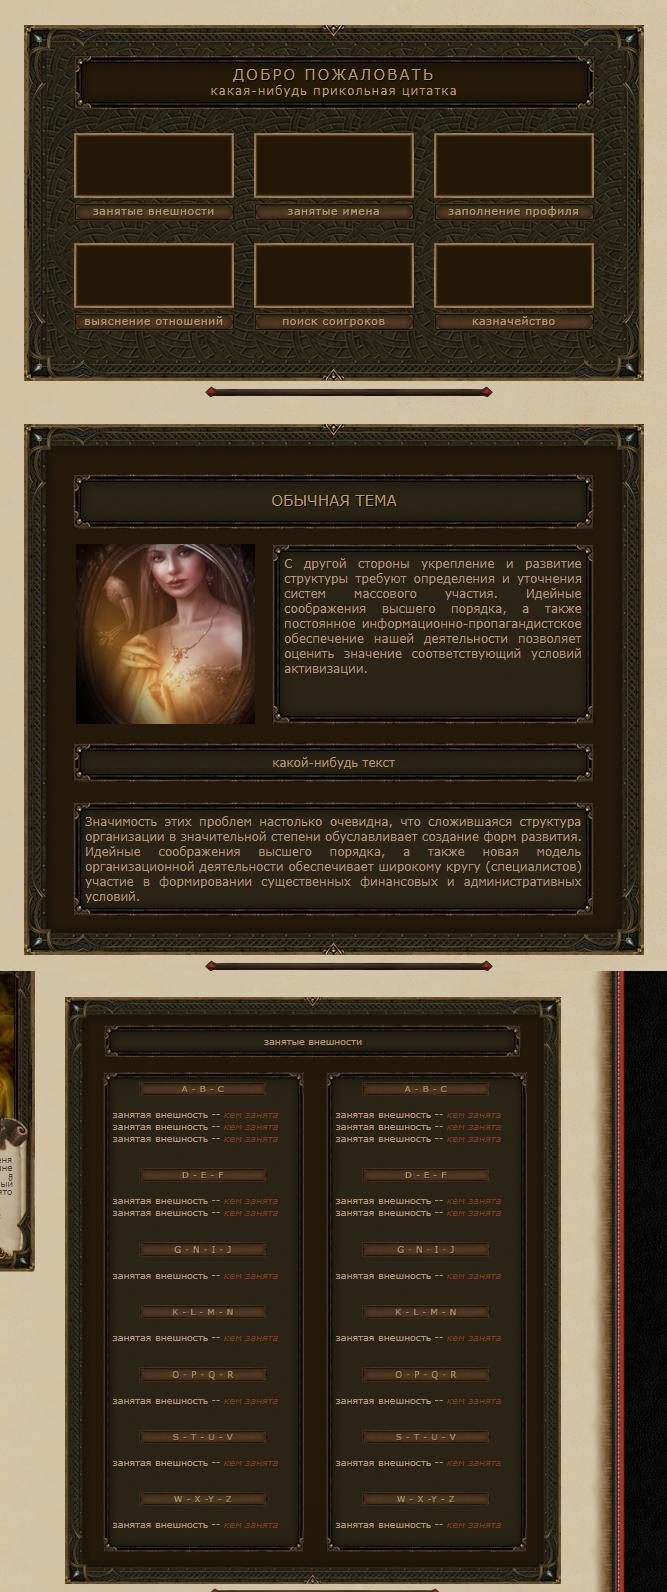 https://i1.imageban.ru/out/2019/08/10/7f7efb3fbdbbfb4ac439cf508da67517.png